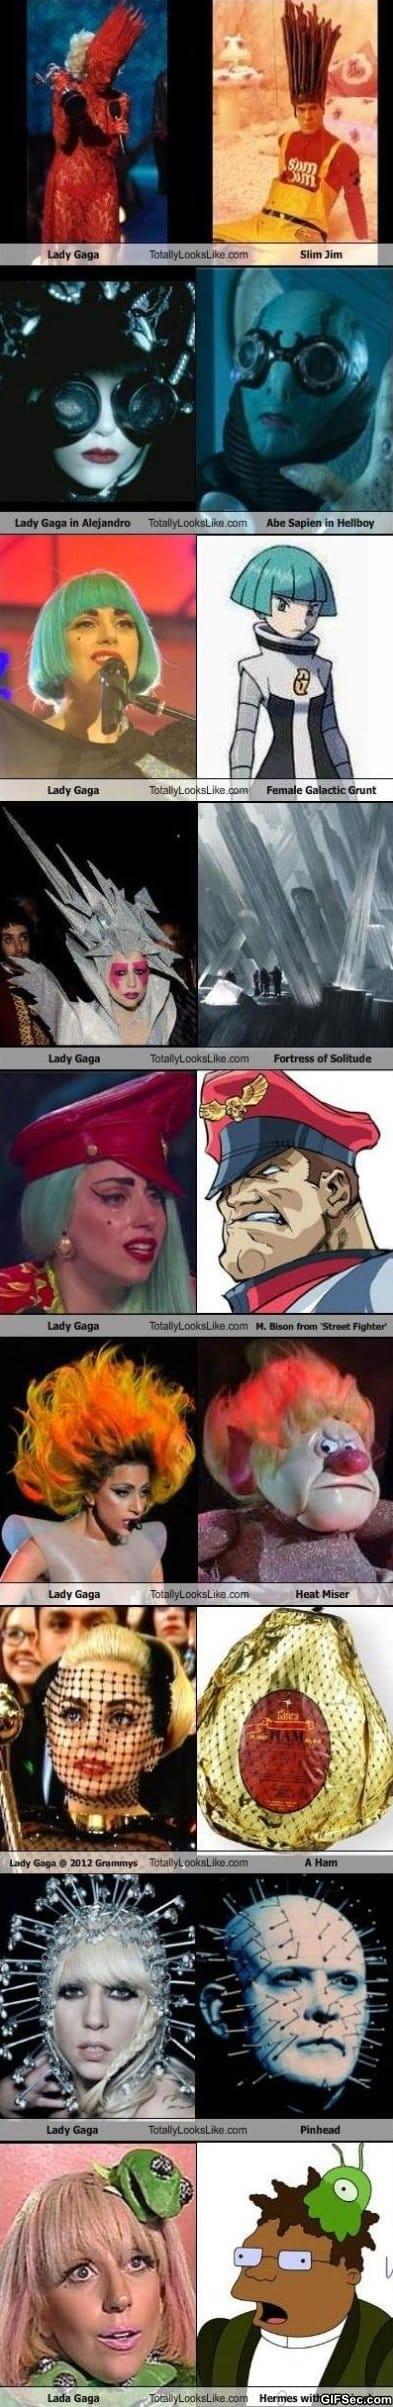 Lady Gaga alook a likes